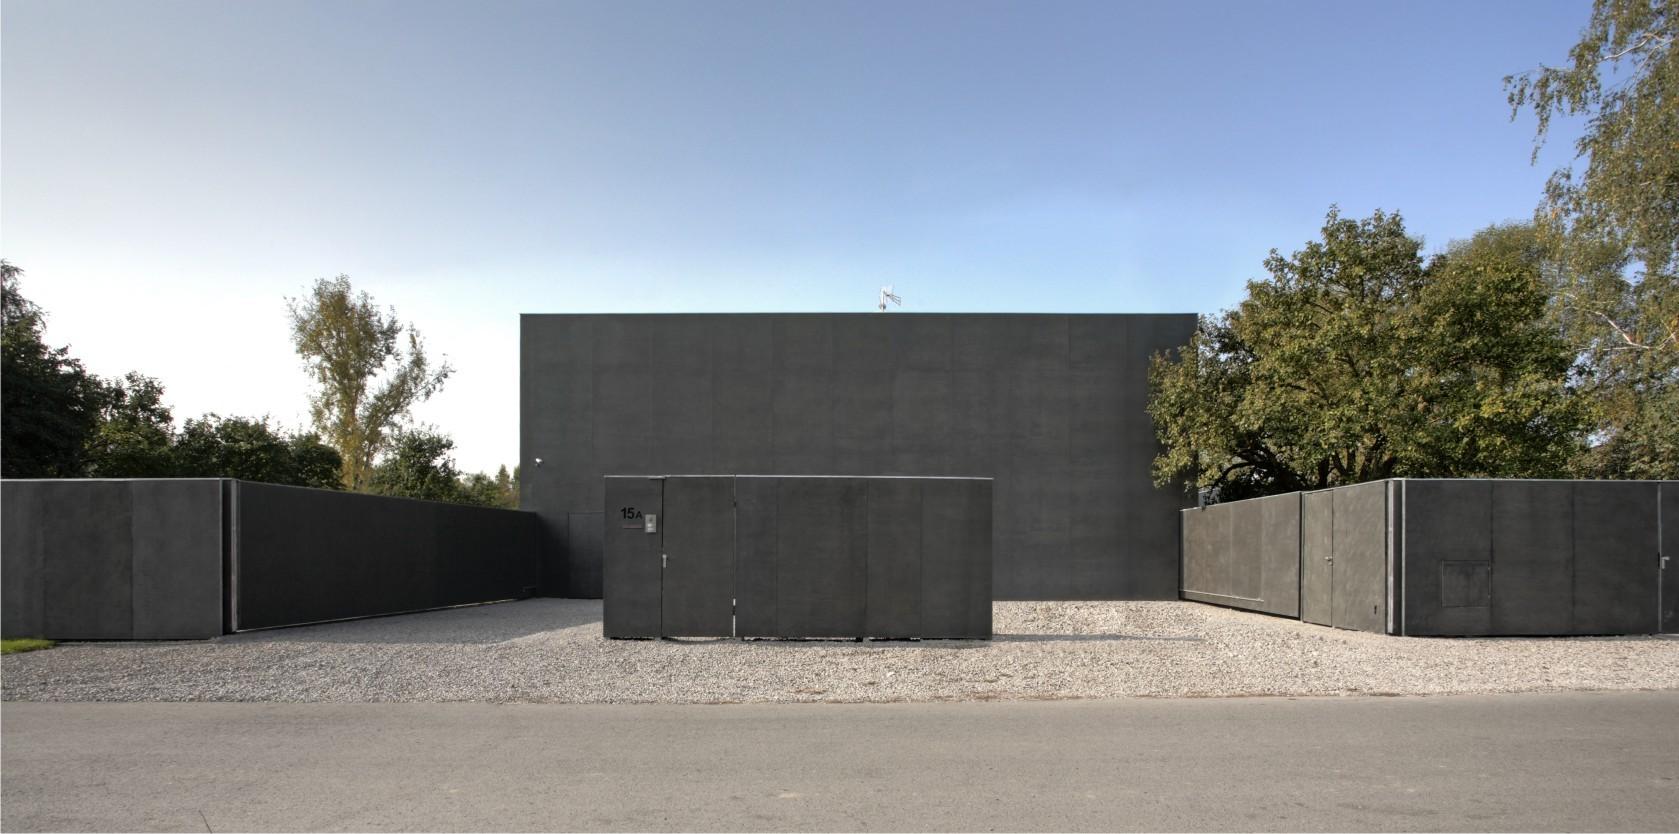 Casa Segura / Robert Konieczny KWK Promes